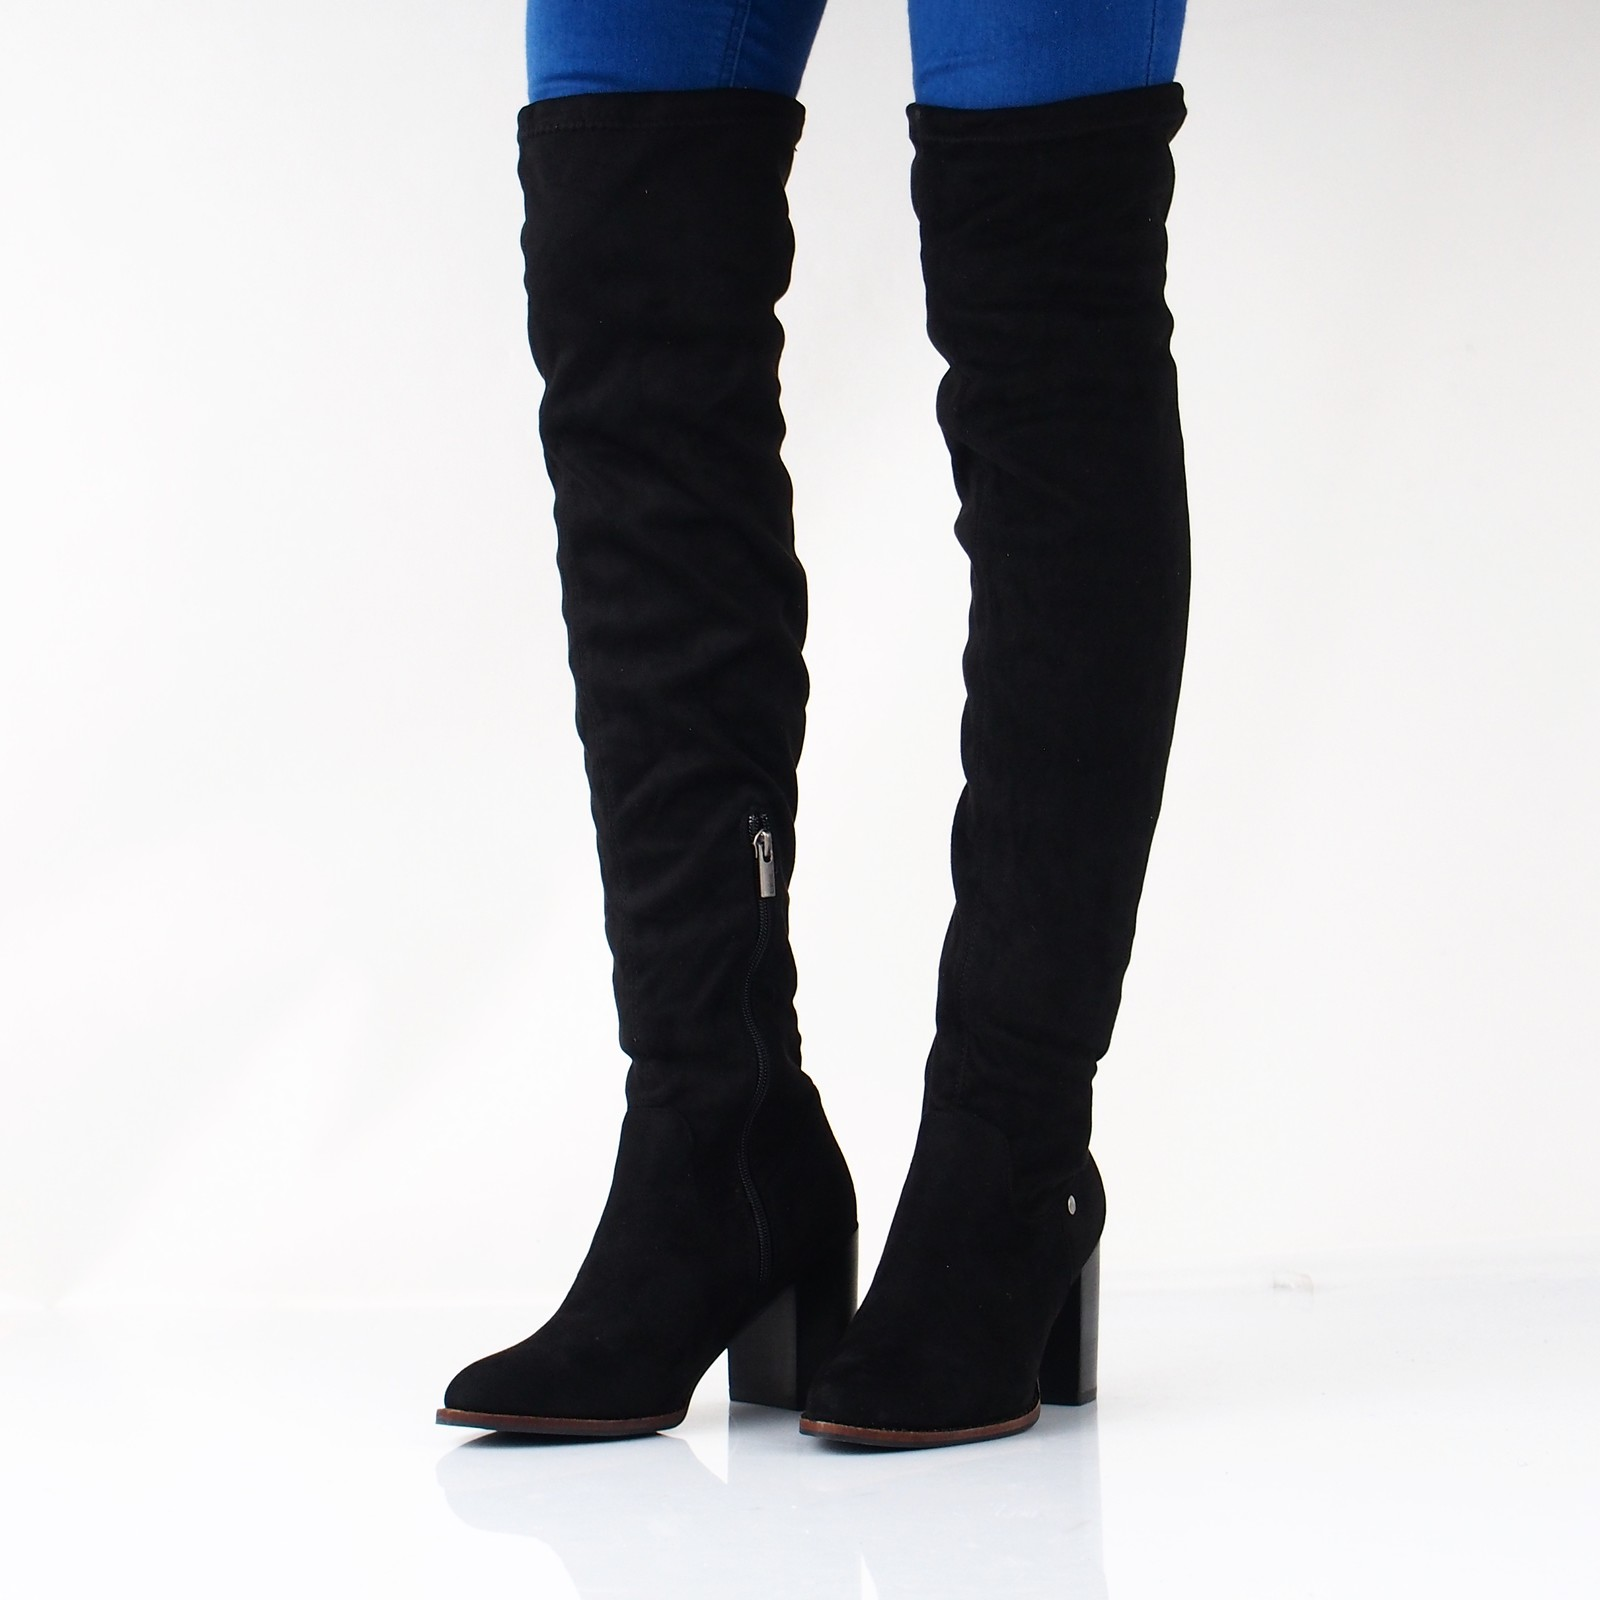 Big Star dámske textilné vysoké čižmy - čierne ... 29960f09dbd